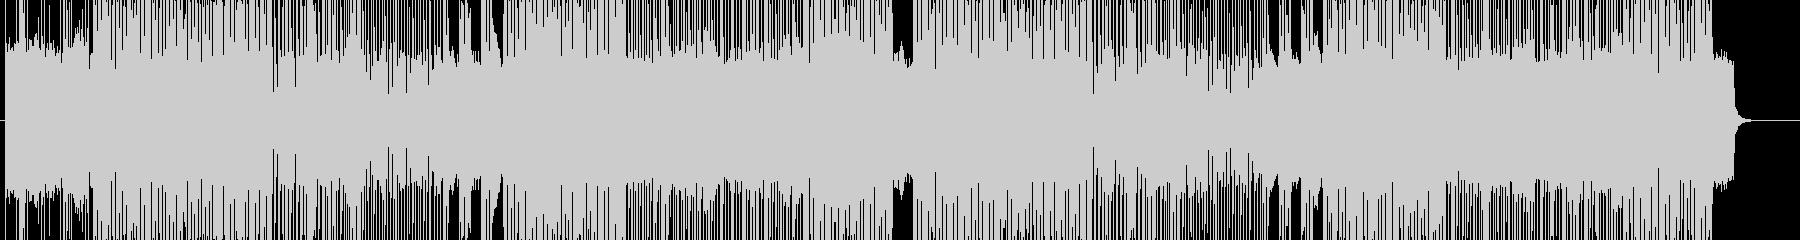 「HR/HM」「DARK」BGM211の未再生の波形